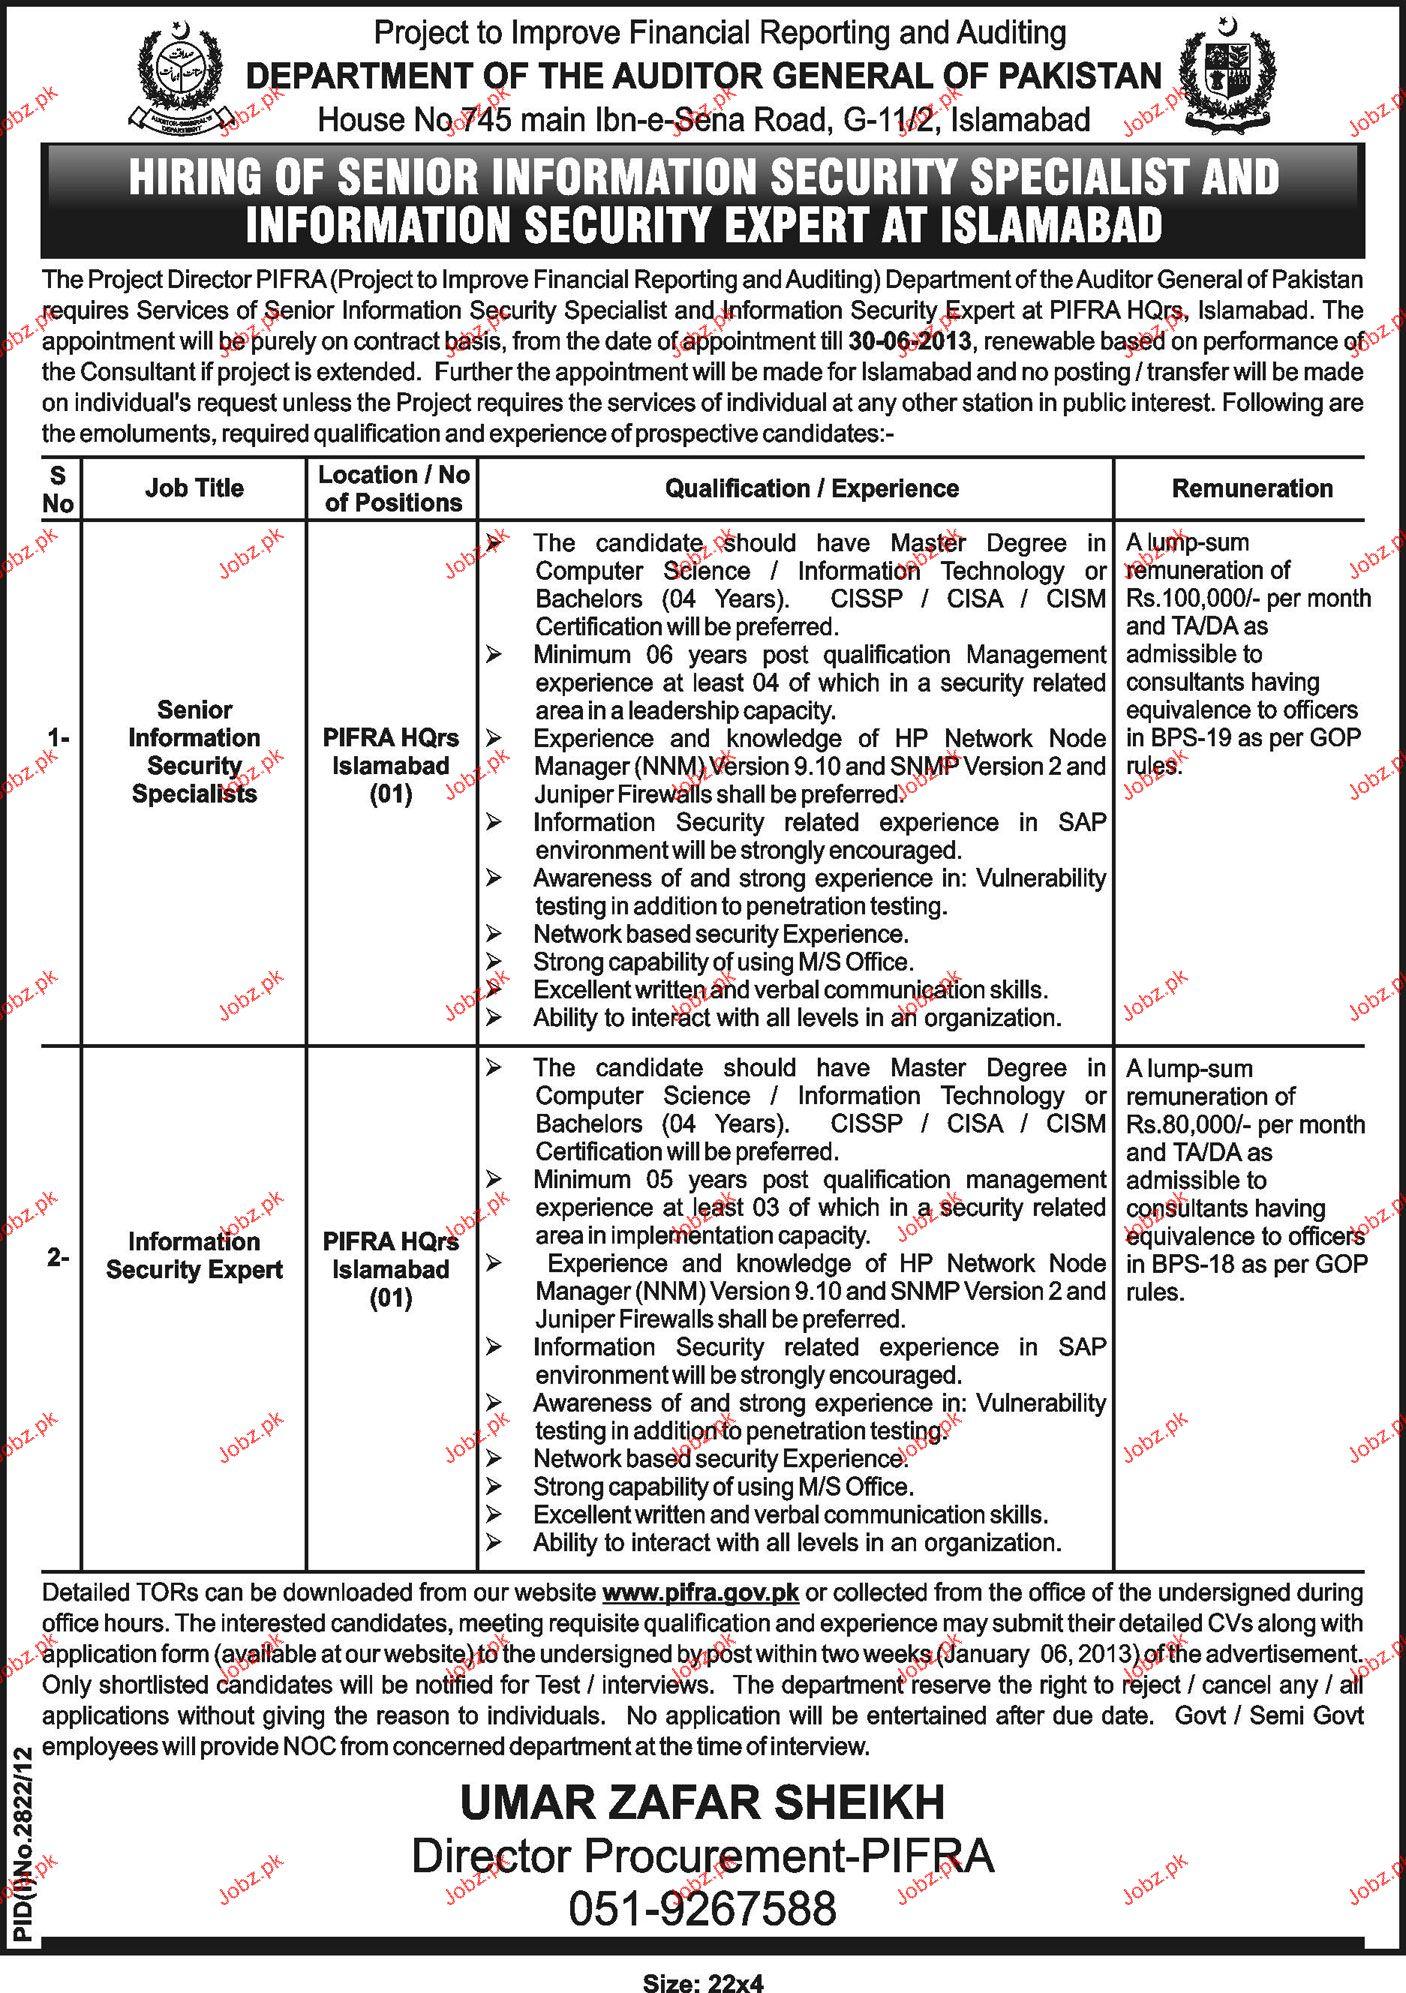 Senior Information Security Specialist Job Opportunity